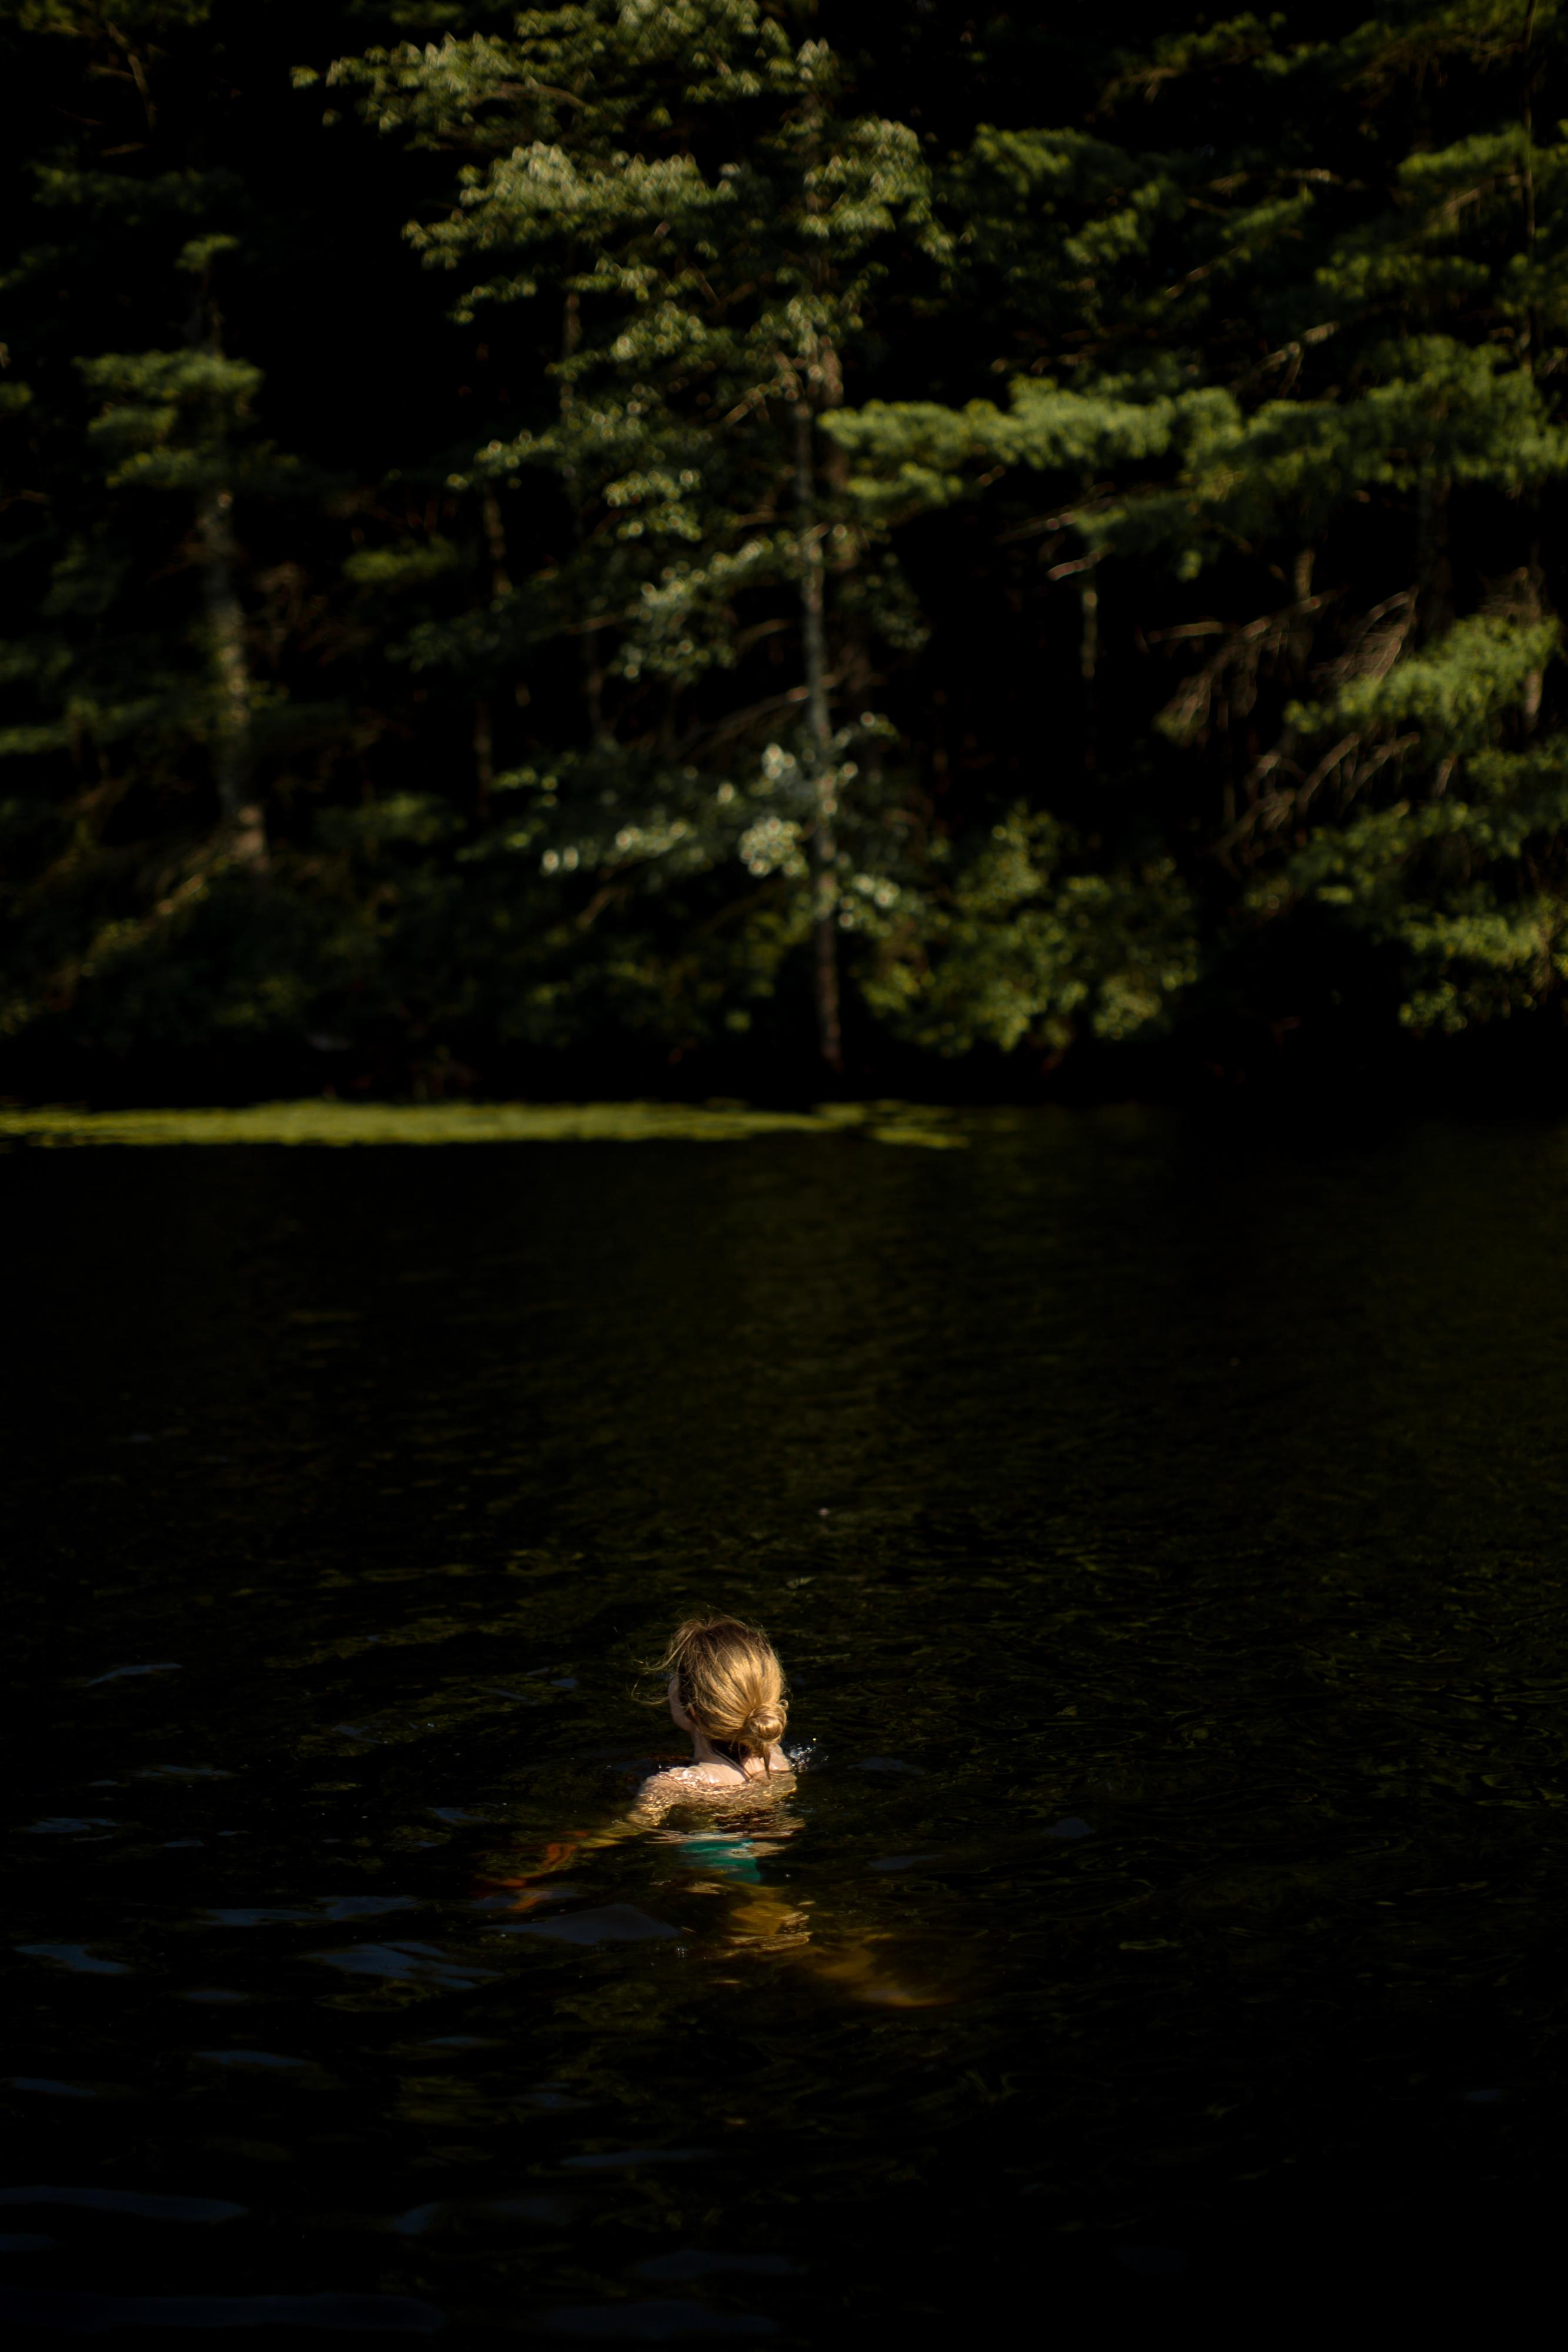 Girl swimming in lake at wood example image 1